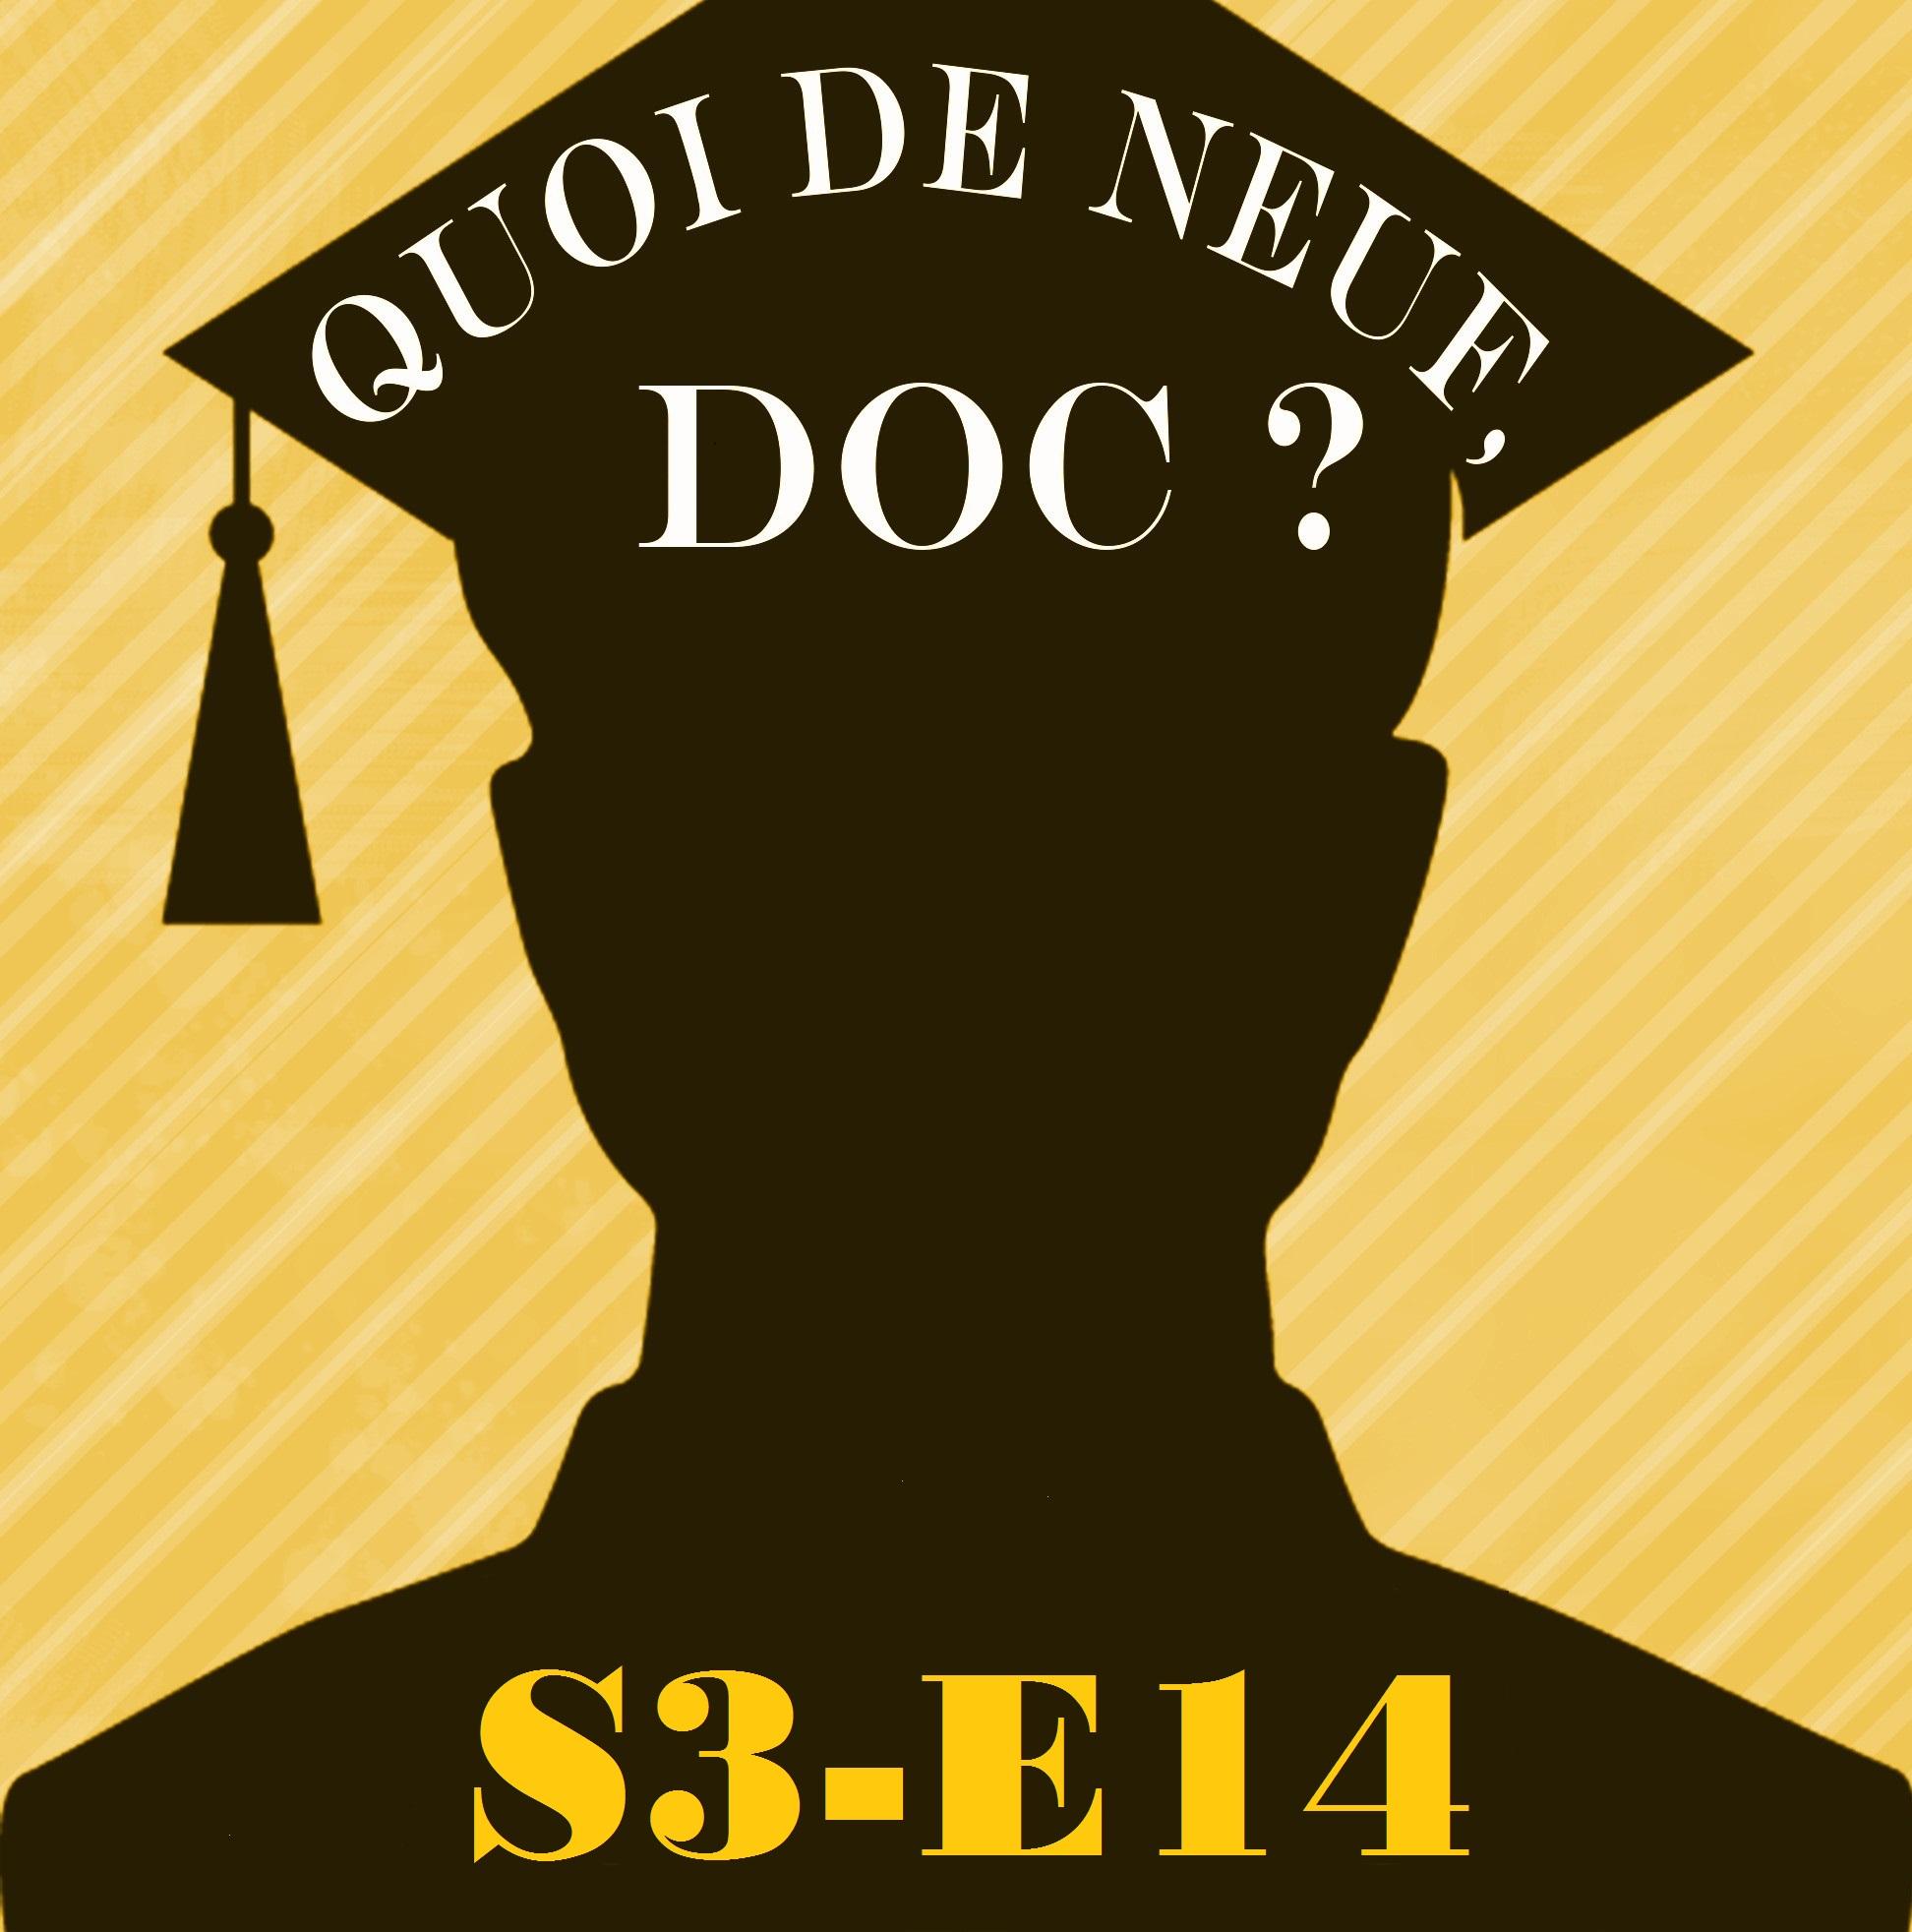 QDND S3E14 Emission du 17 Mai